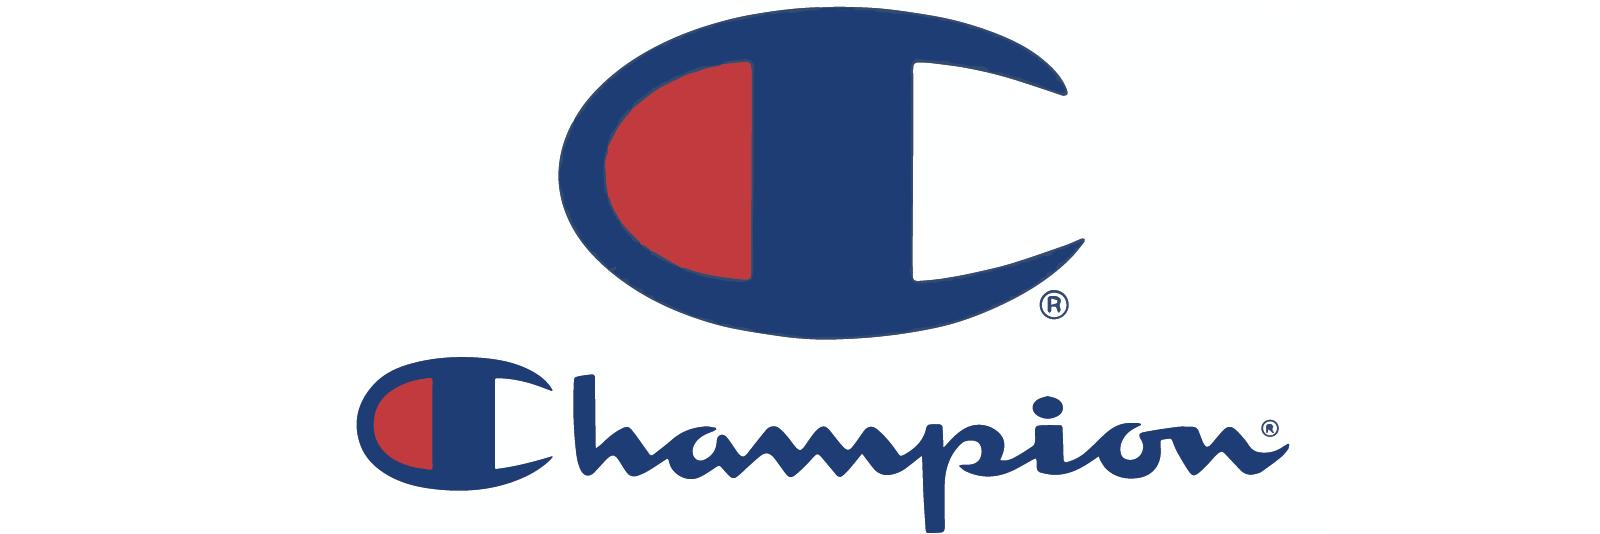 Champion - Abstract